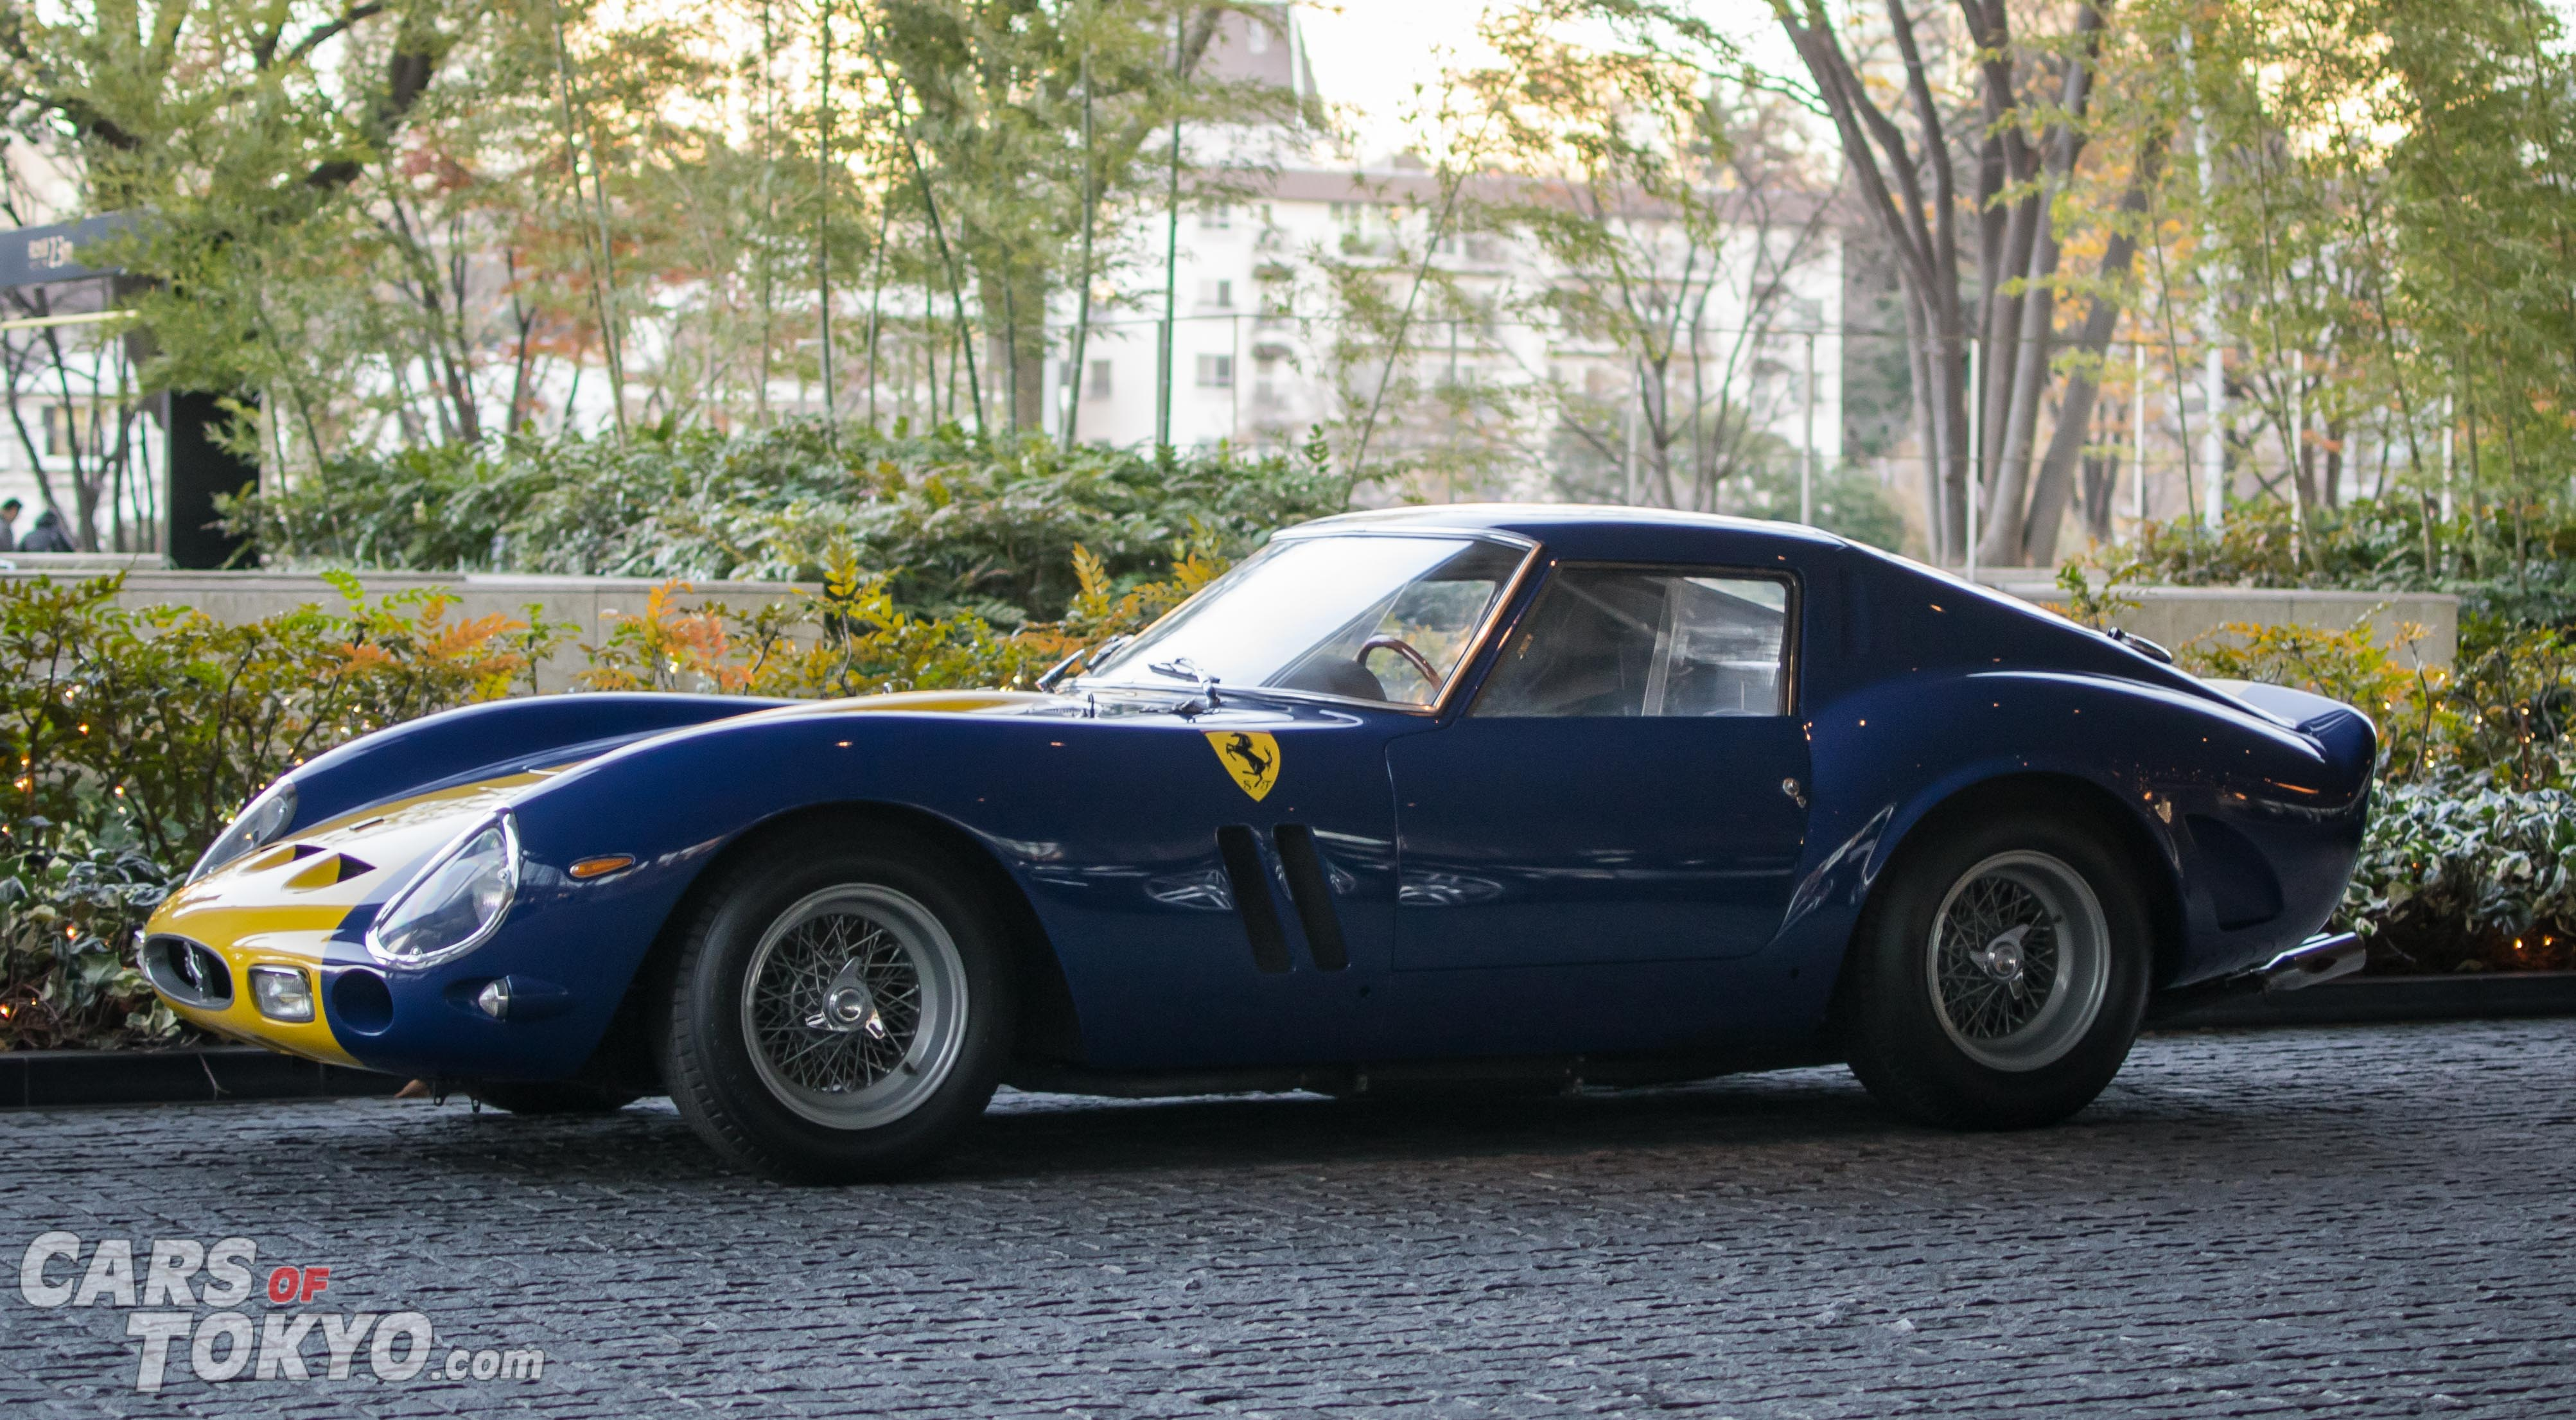 Cars of Tokyo Classic Ferrari 250 GTO